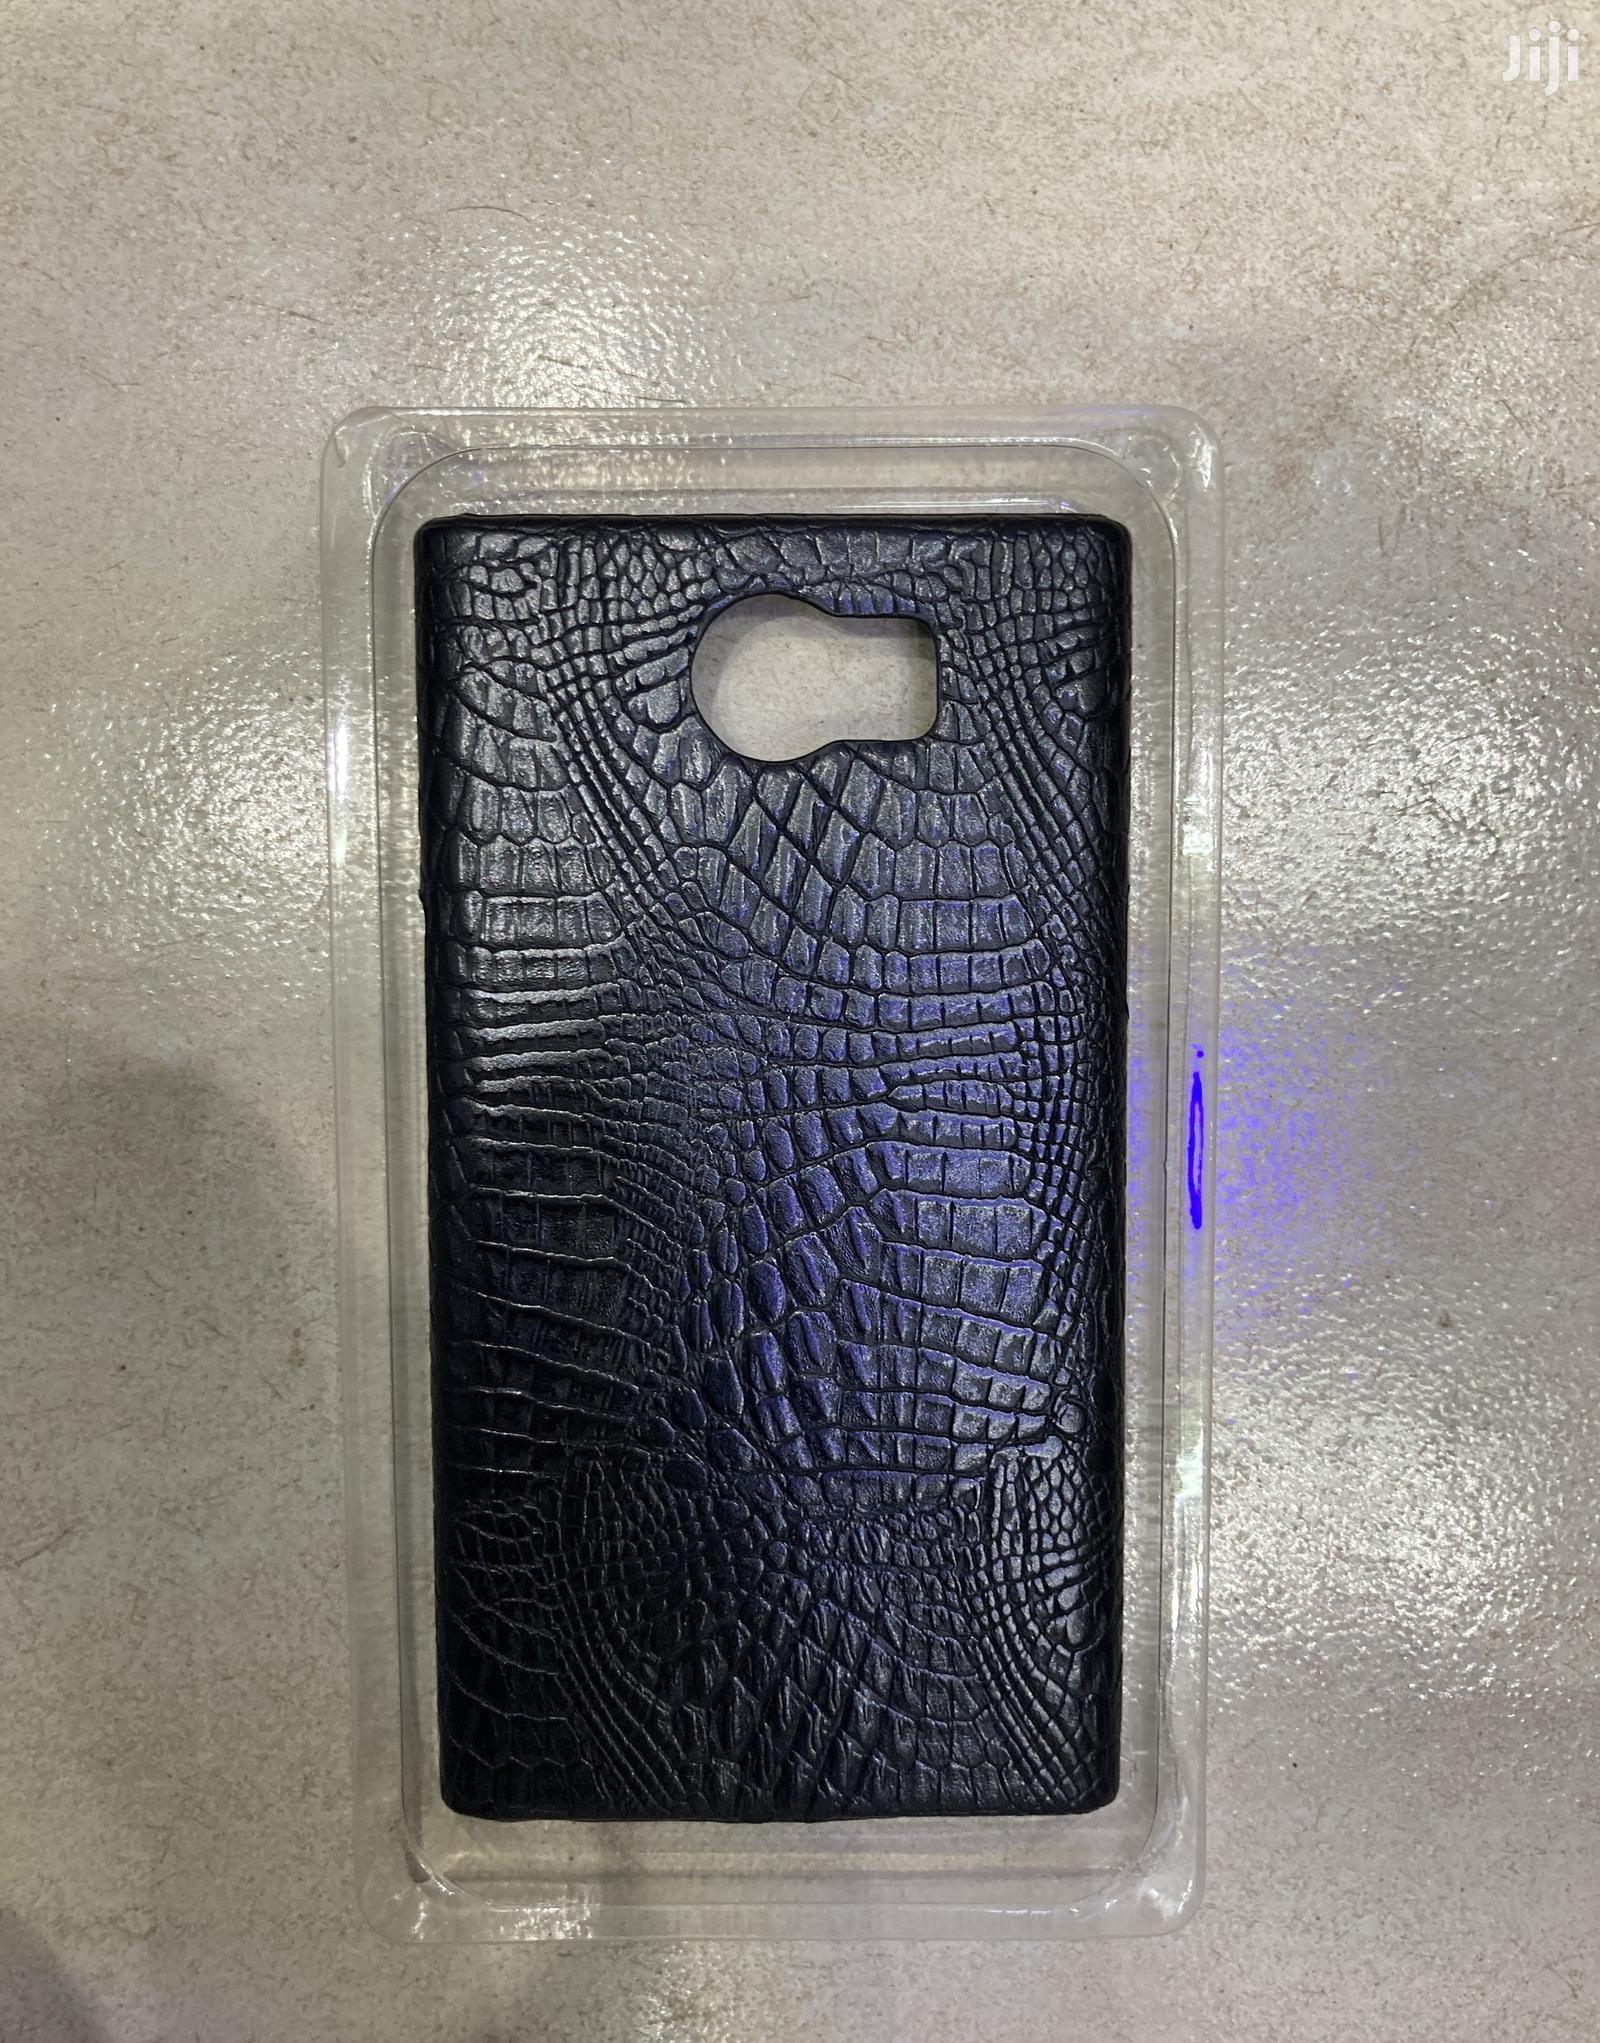 Blackberry Priv Croco Design Back Case